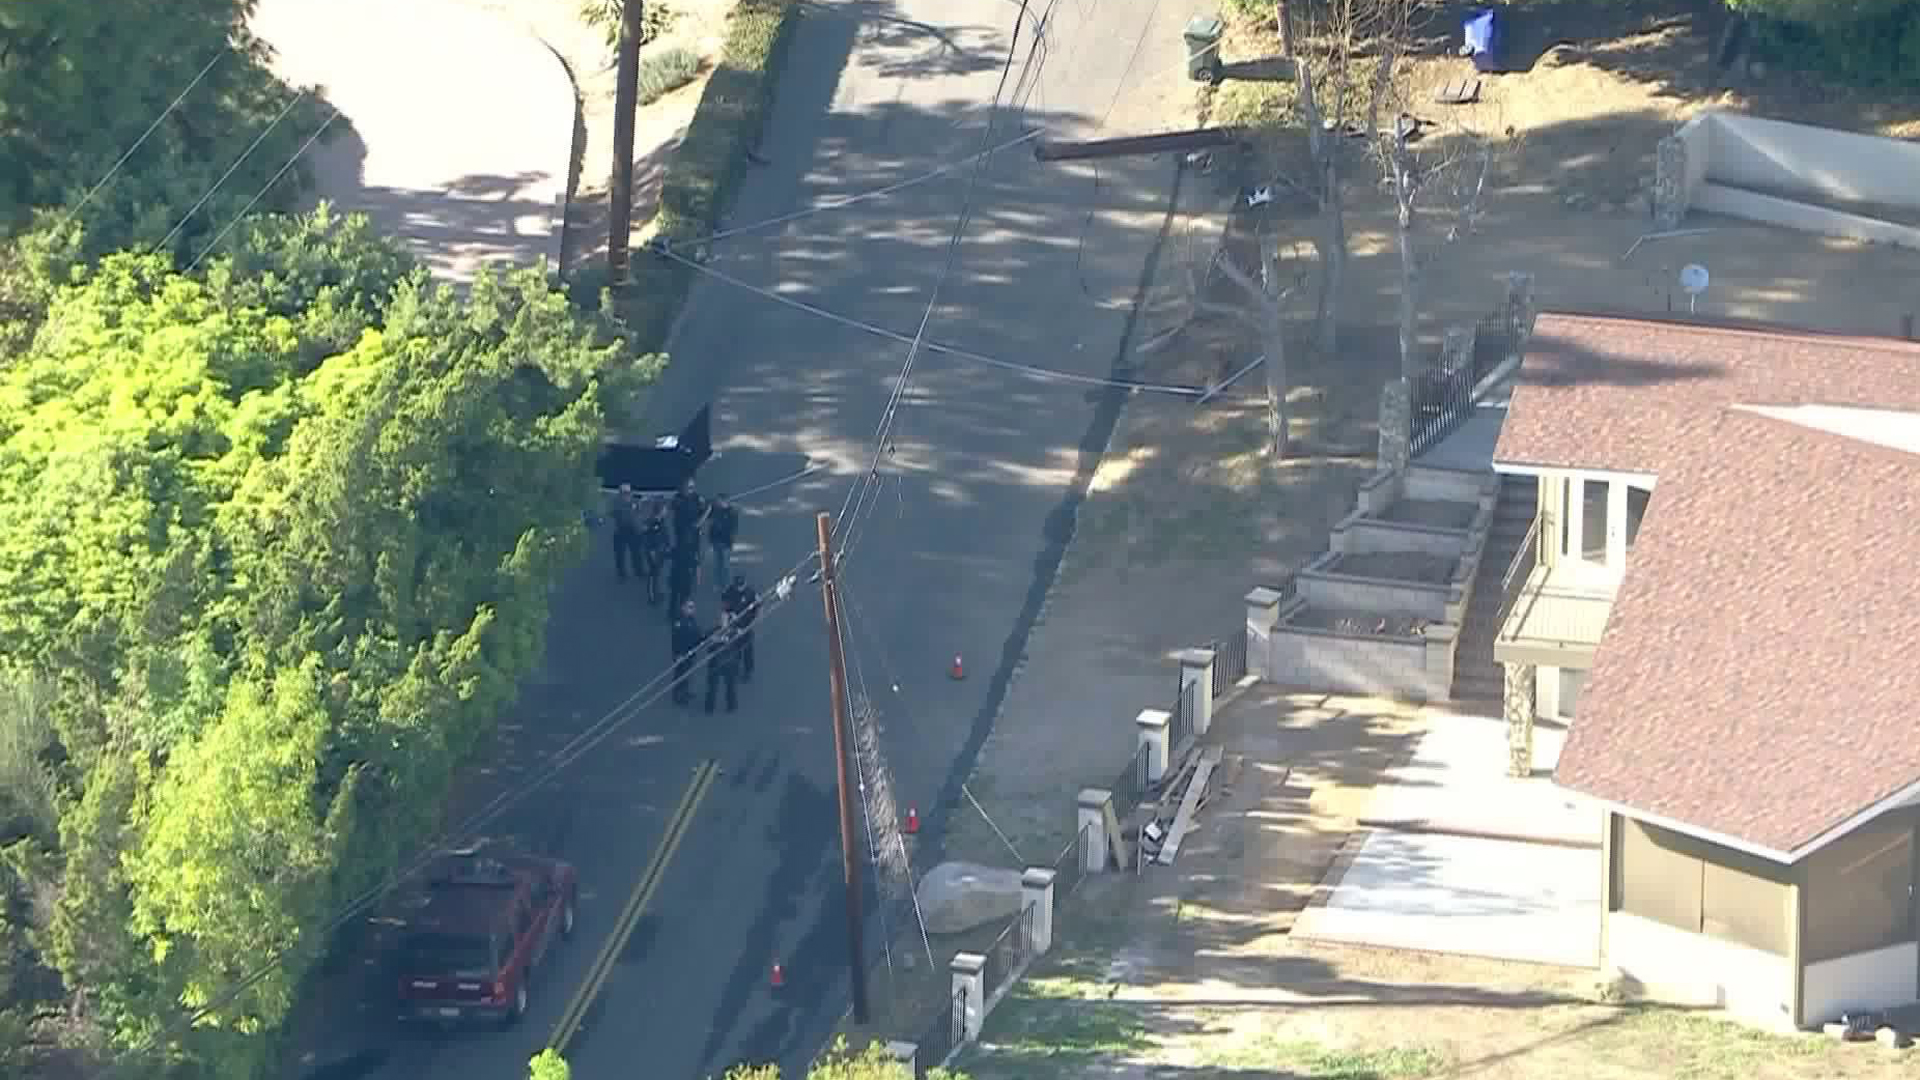 Police investigate after a pursuit ended in a fatal crash in Upland on Feb. 25, 2020. (KTLA)